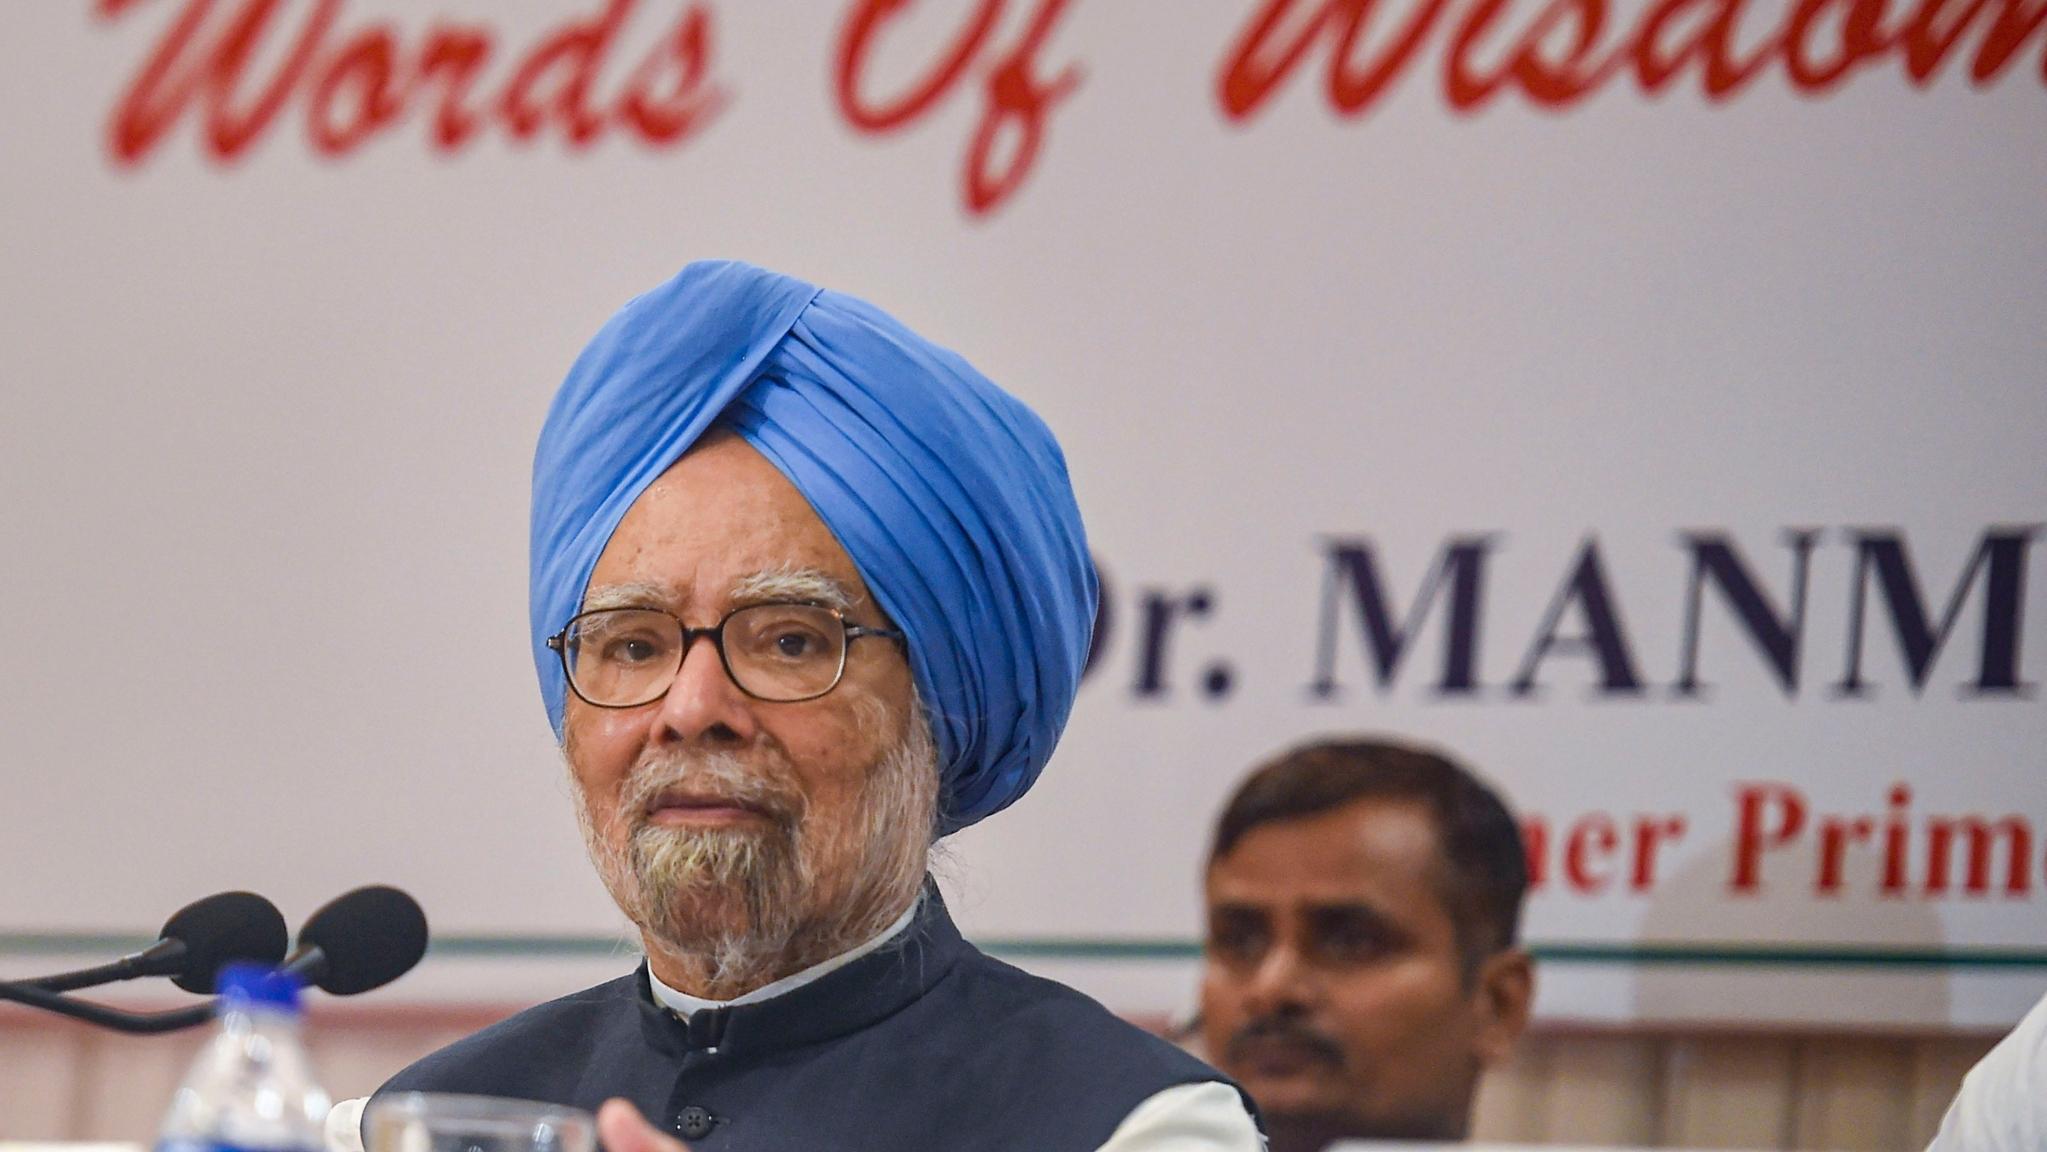 'Erosion of Trust': Manmohan Singh on Economy's 'Precarious State'